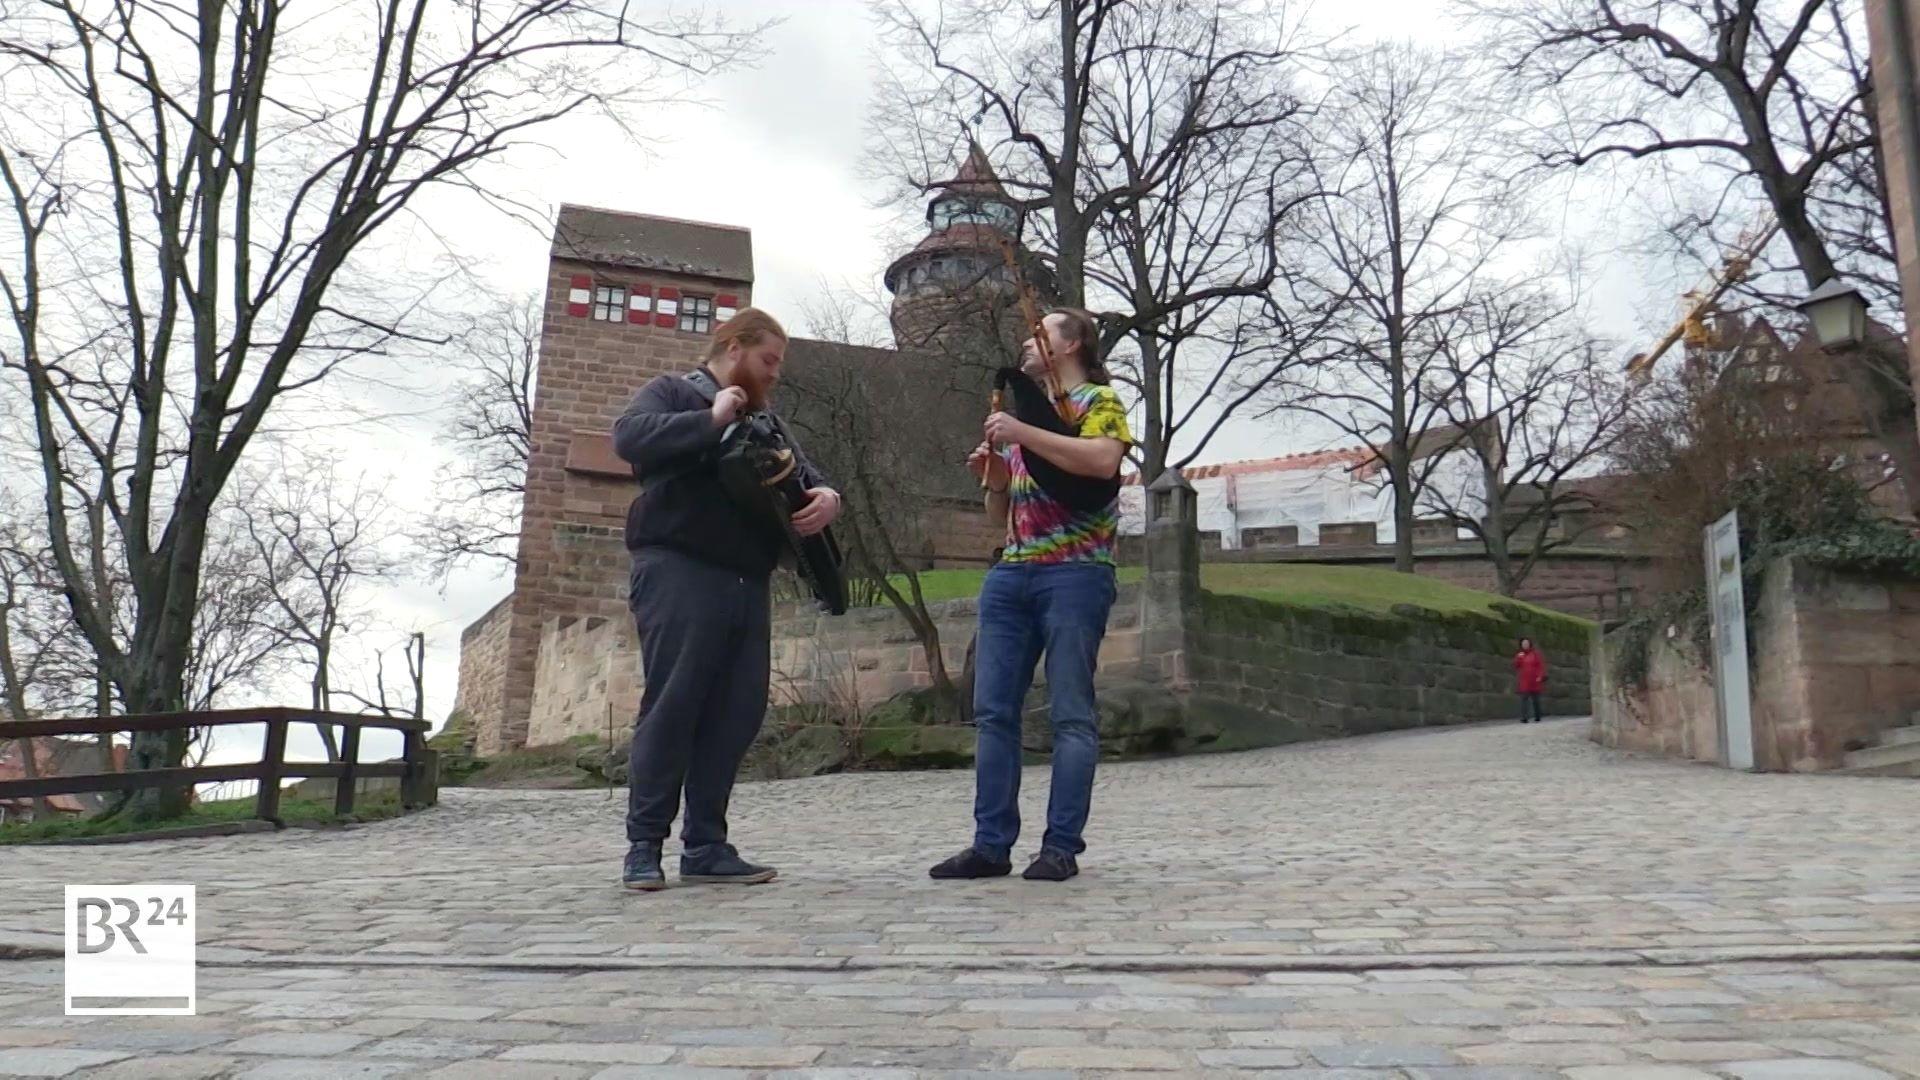 Drehleier und Dudelsack bei den 3. Borduntagen in Nürnberg